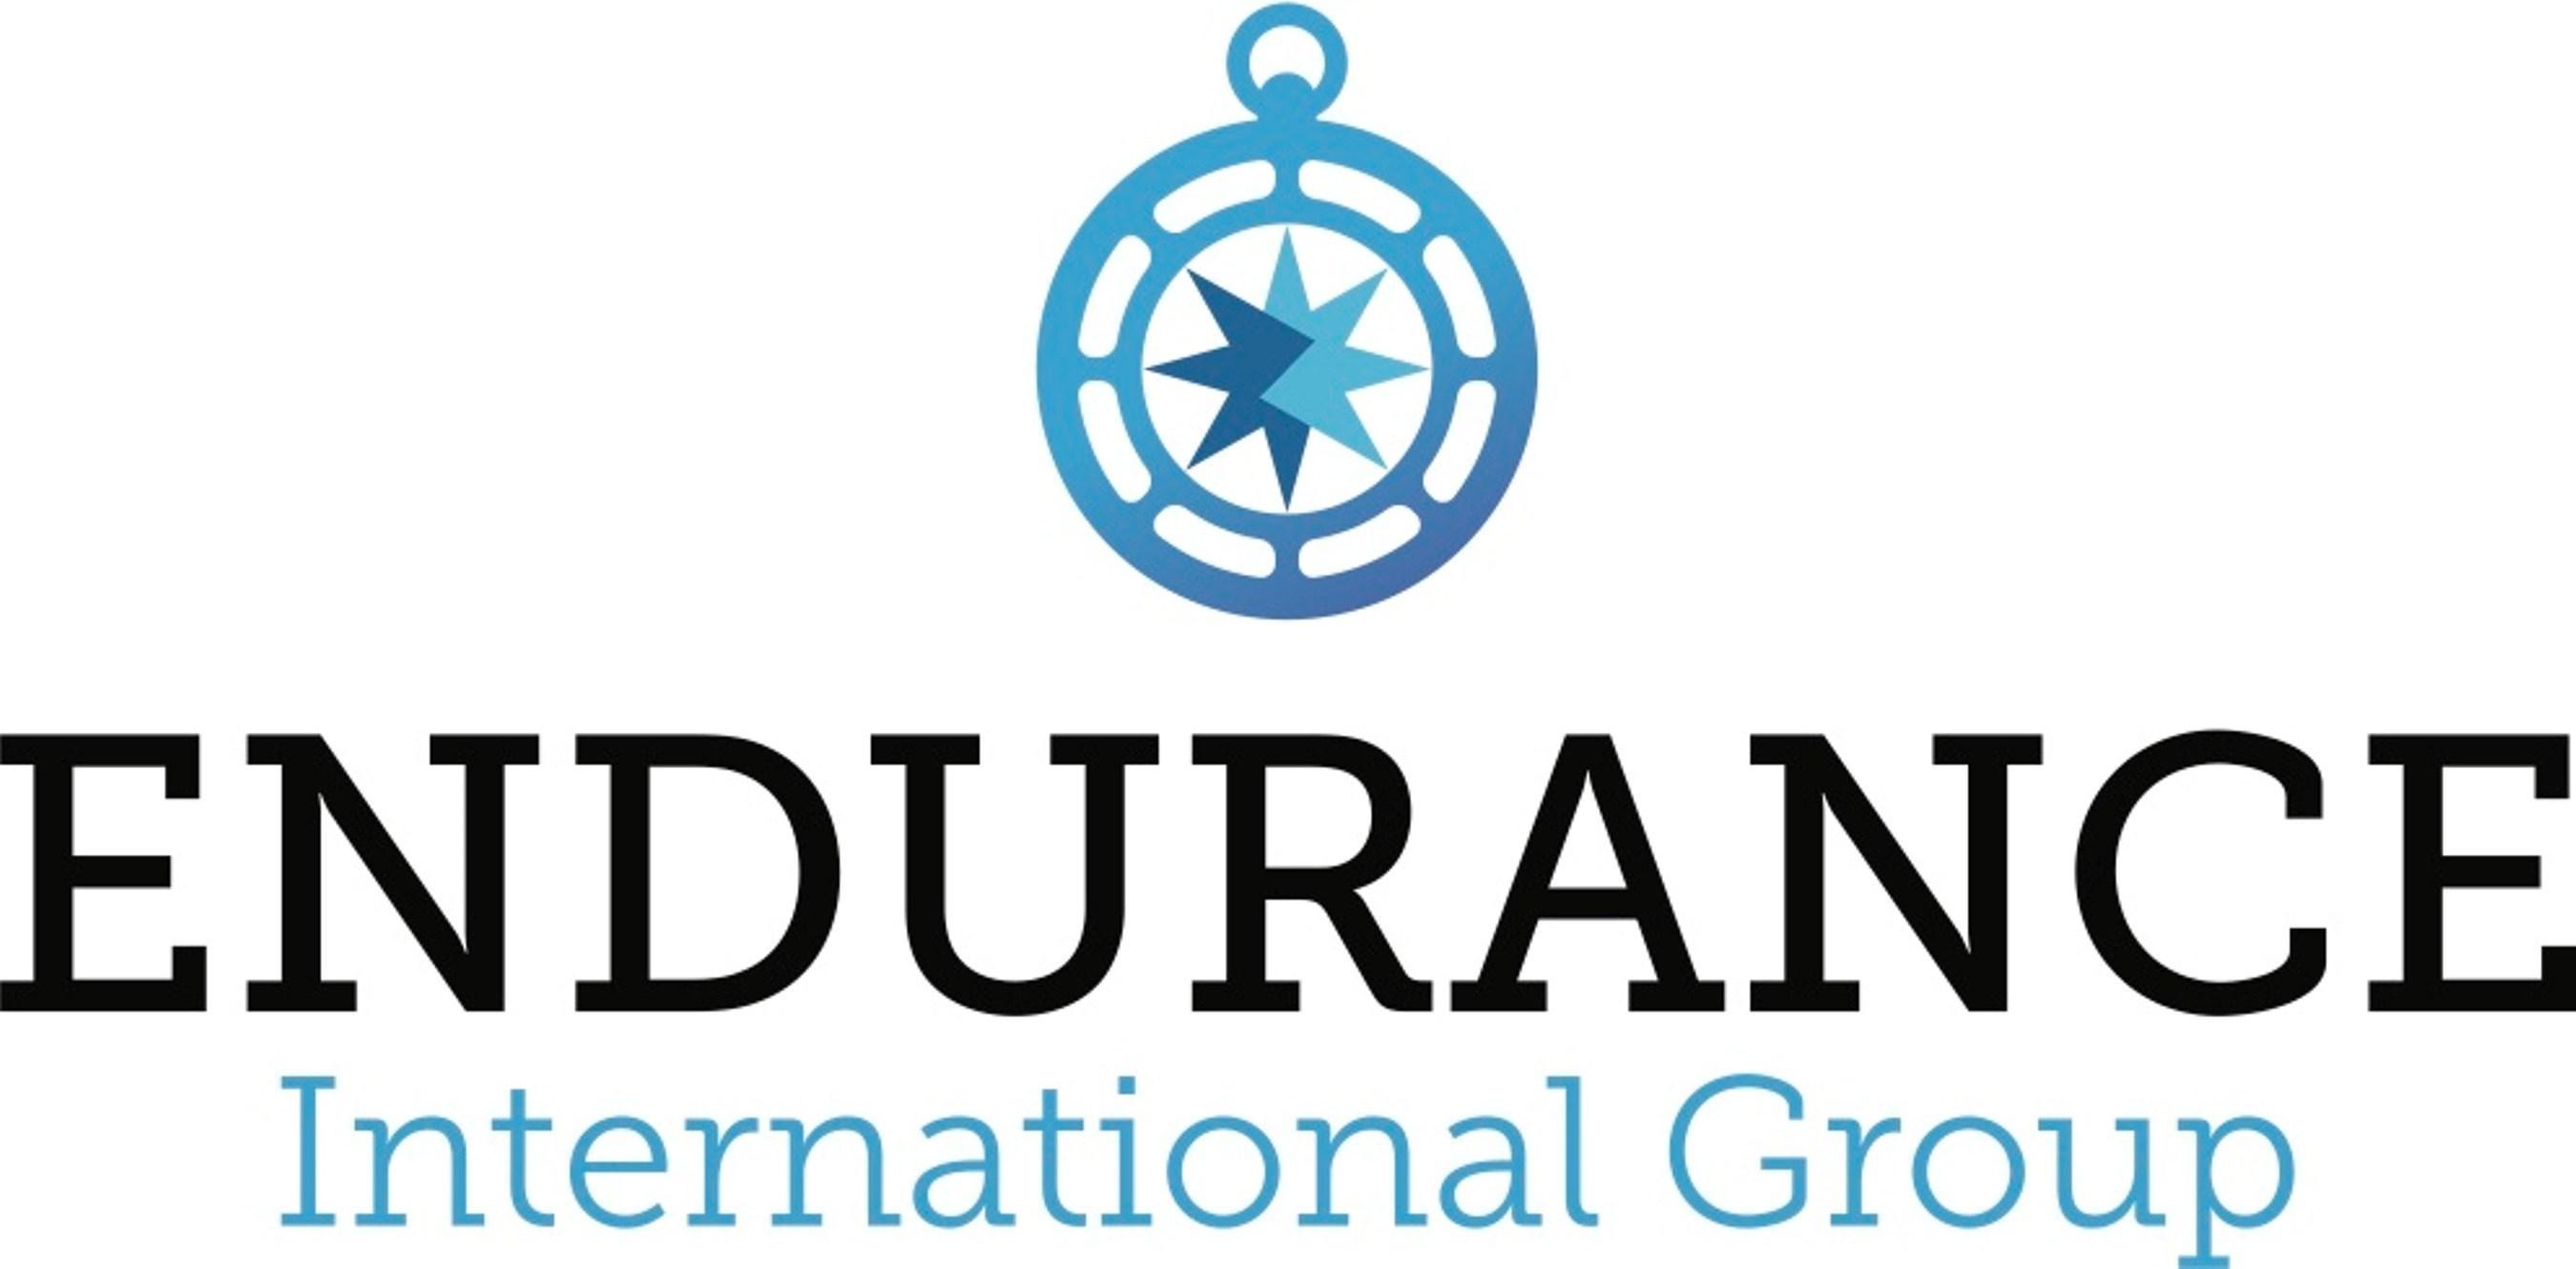 Endurance International Group Logo